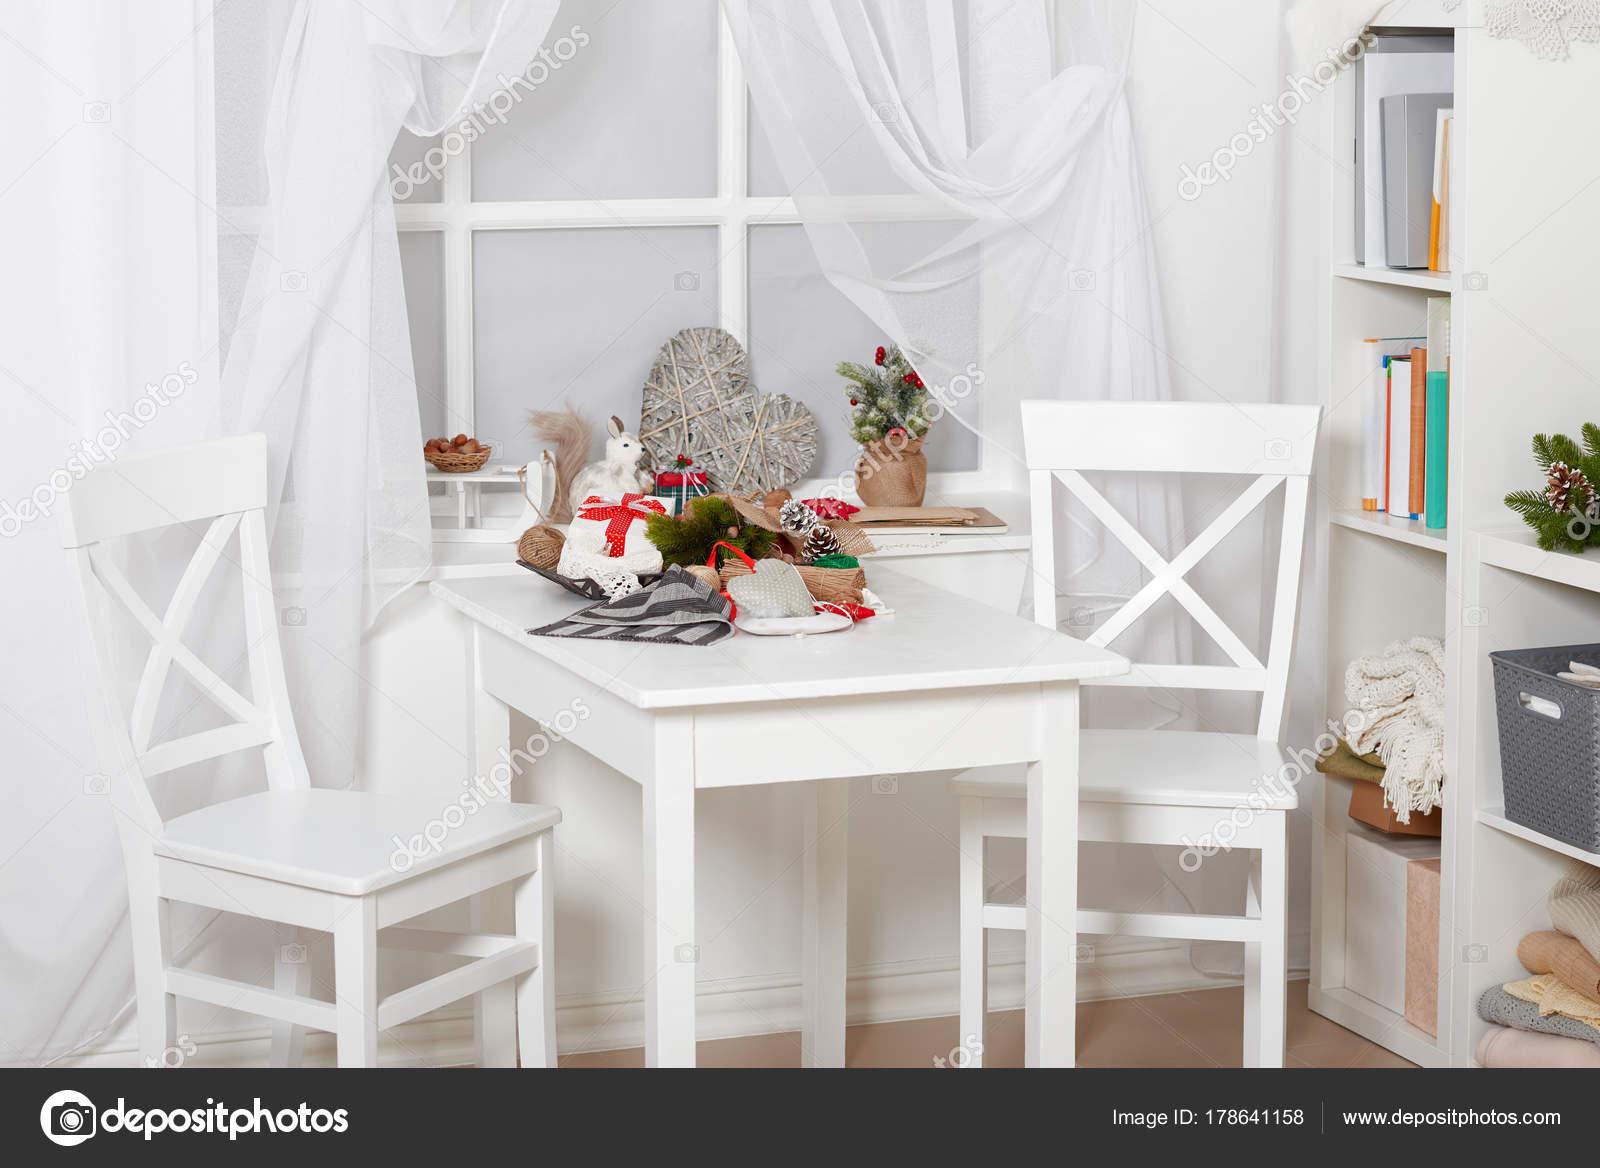 Witte kamer interieur met decoratie van kerstmis venster tafel en